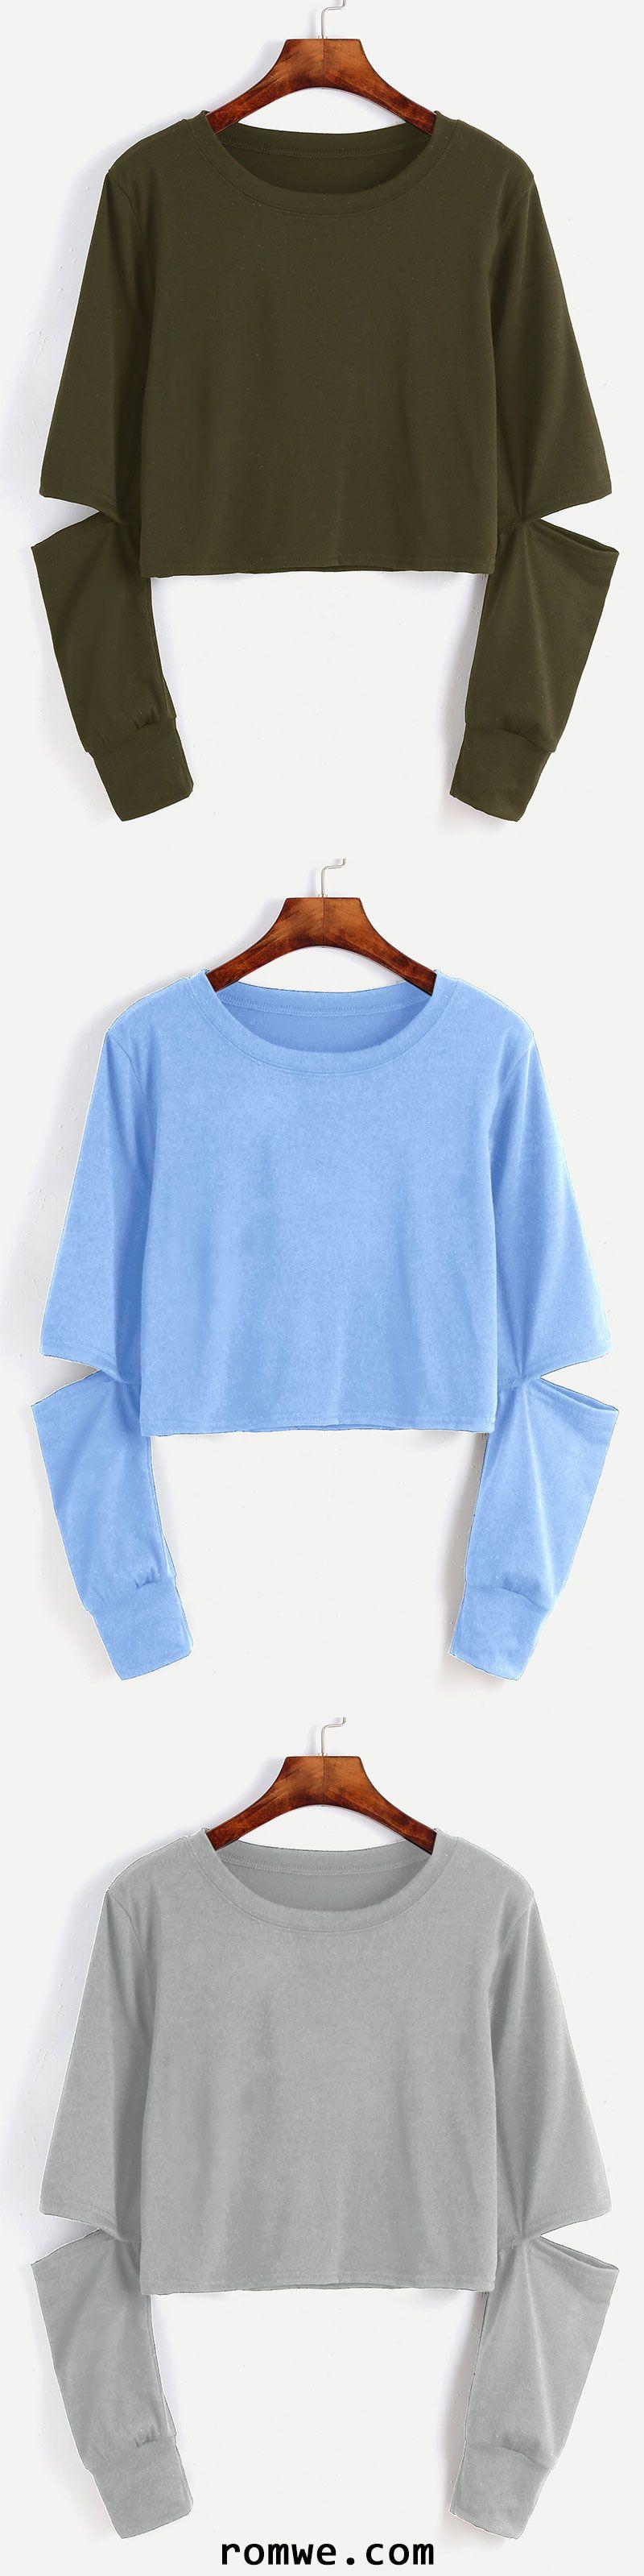 blue cut out sleeve crop sweatshirt sch ne klamotten. Black Bedroom Furniture Sets. Home Design Ideas